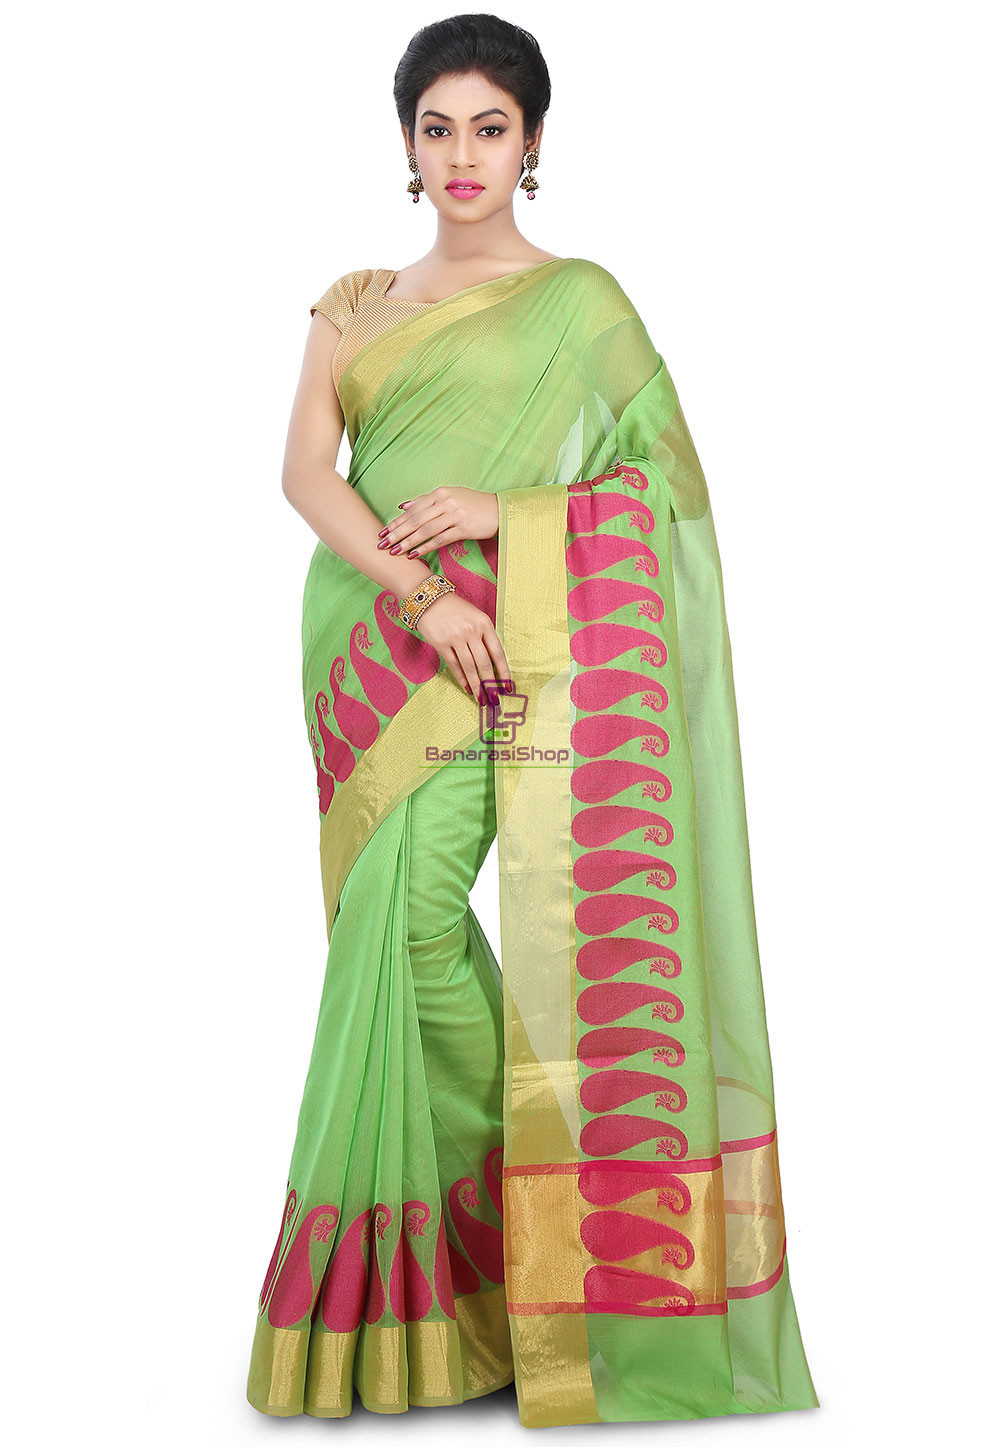 Woven Banarasi Chanderi Cotton Saree in Light Green 1